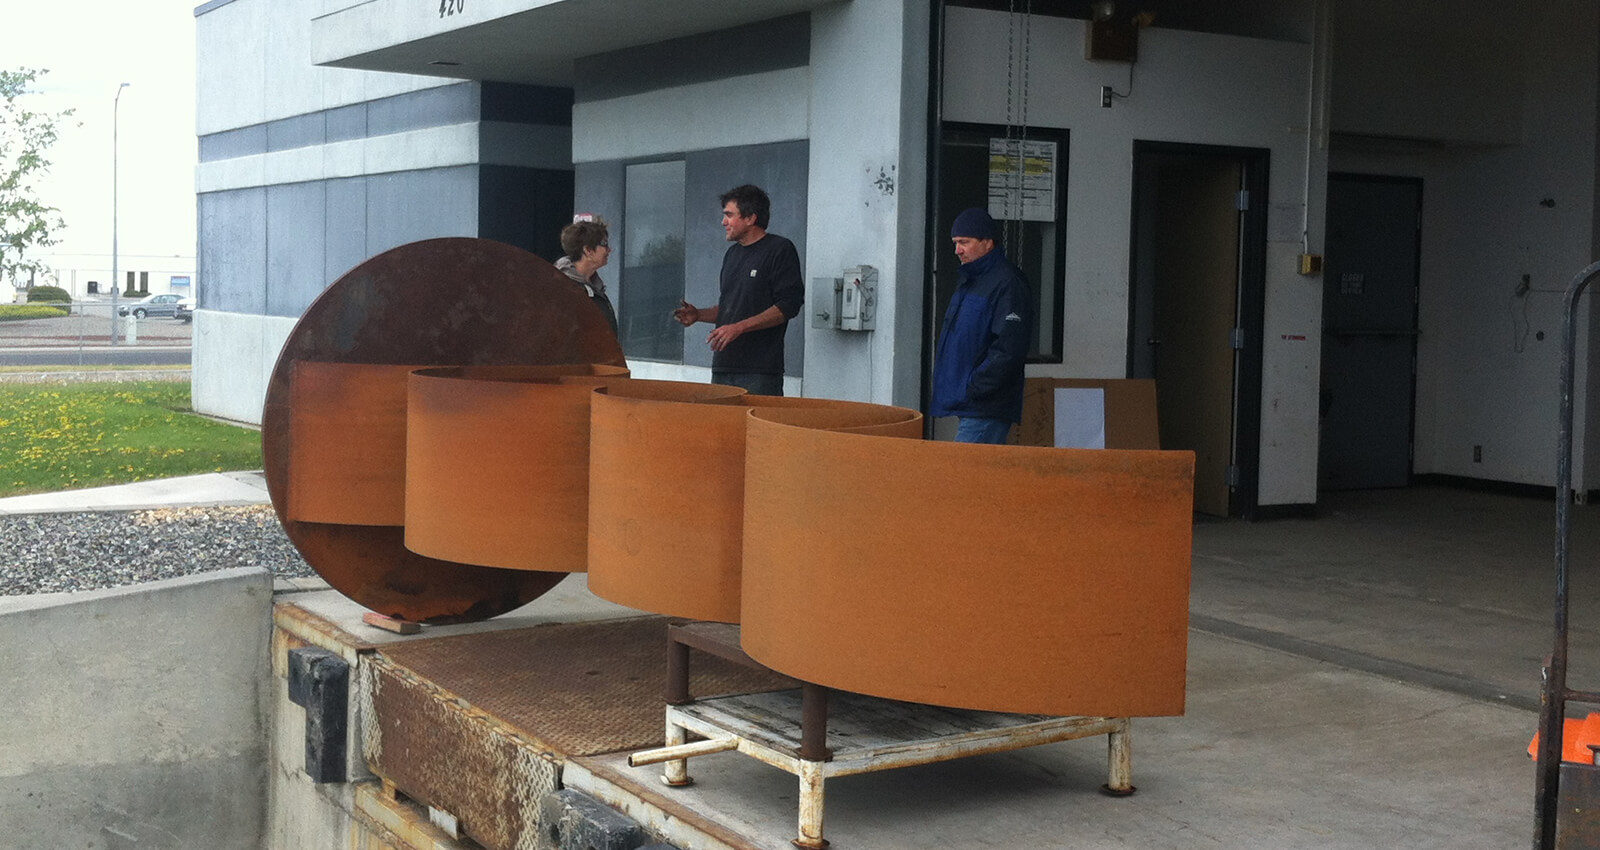 Aspirations art installation during fabrication.